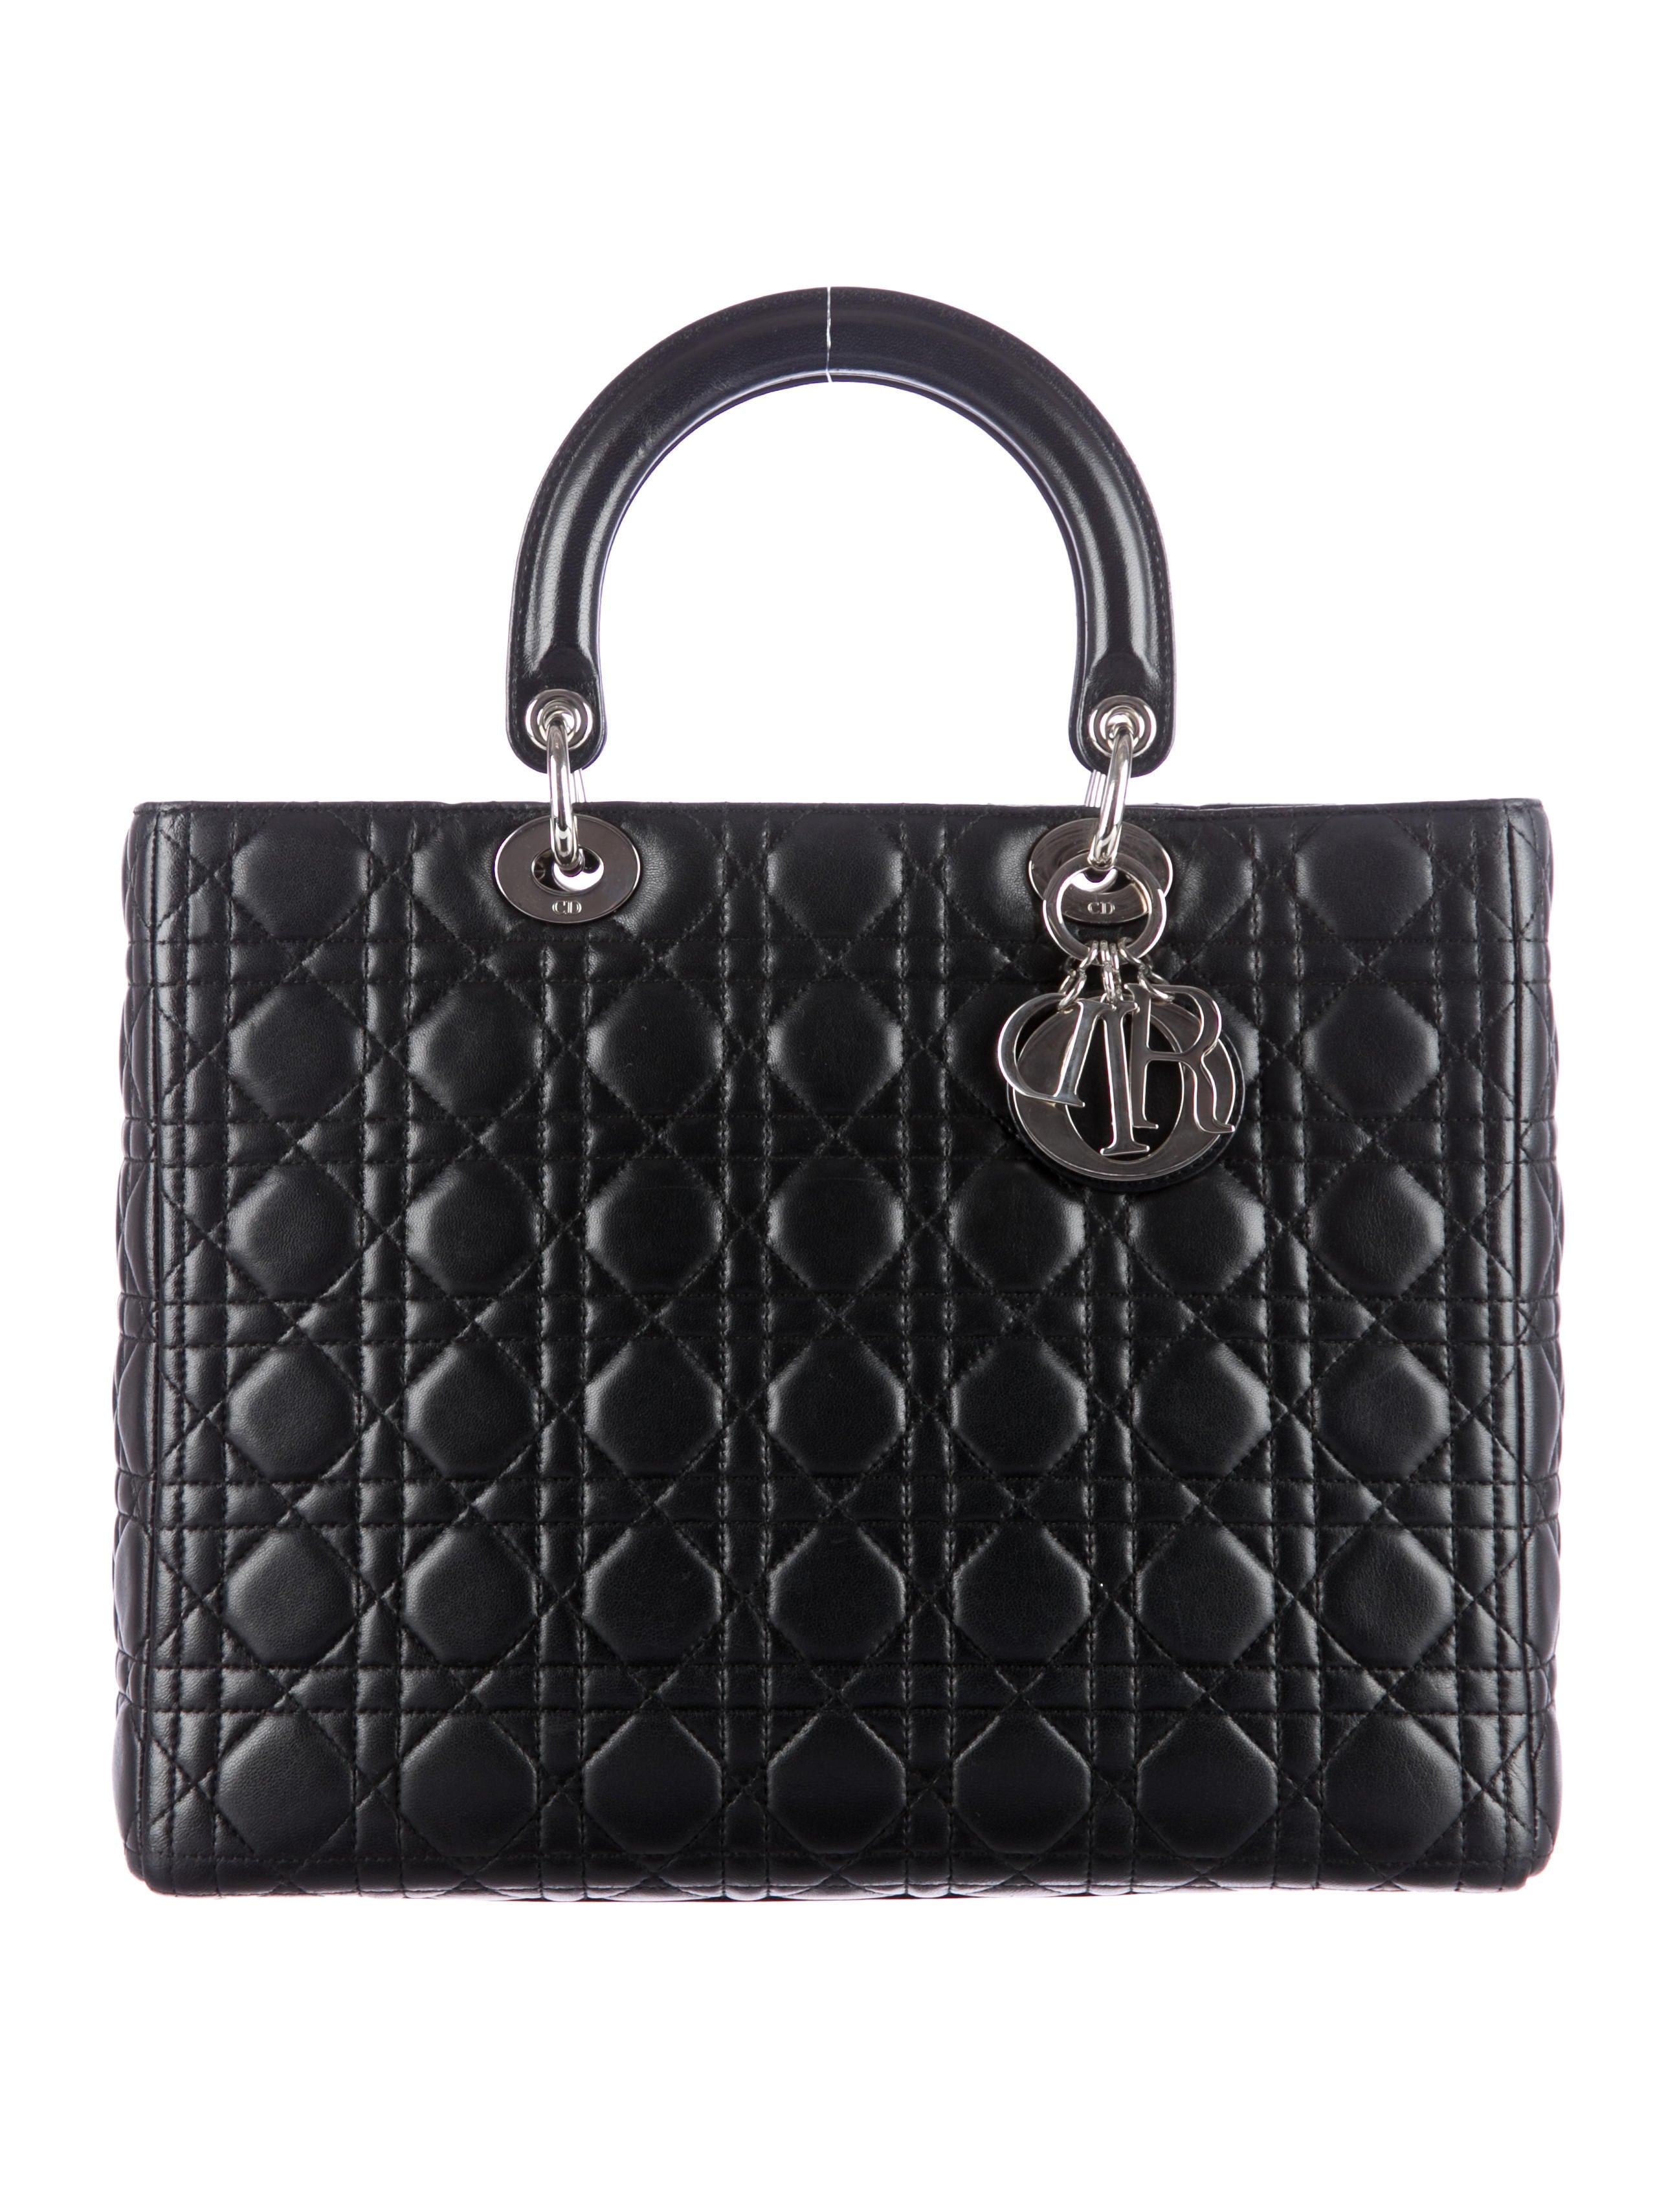 Luxury 2012newDiorhandbags0902blackwomenbags_5484_1  MuslimState